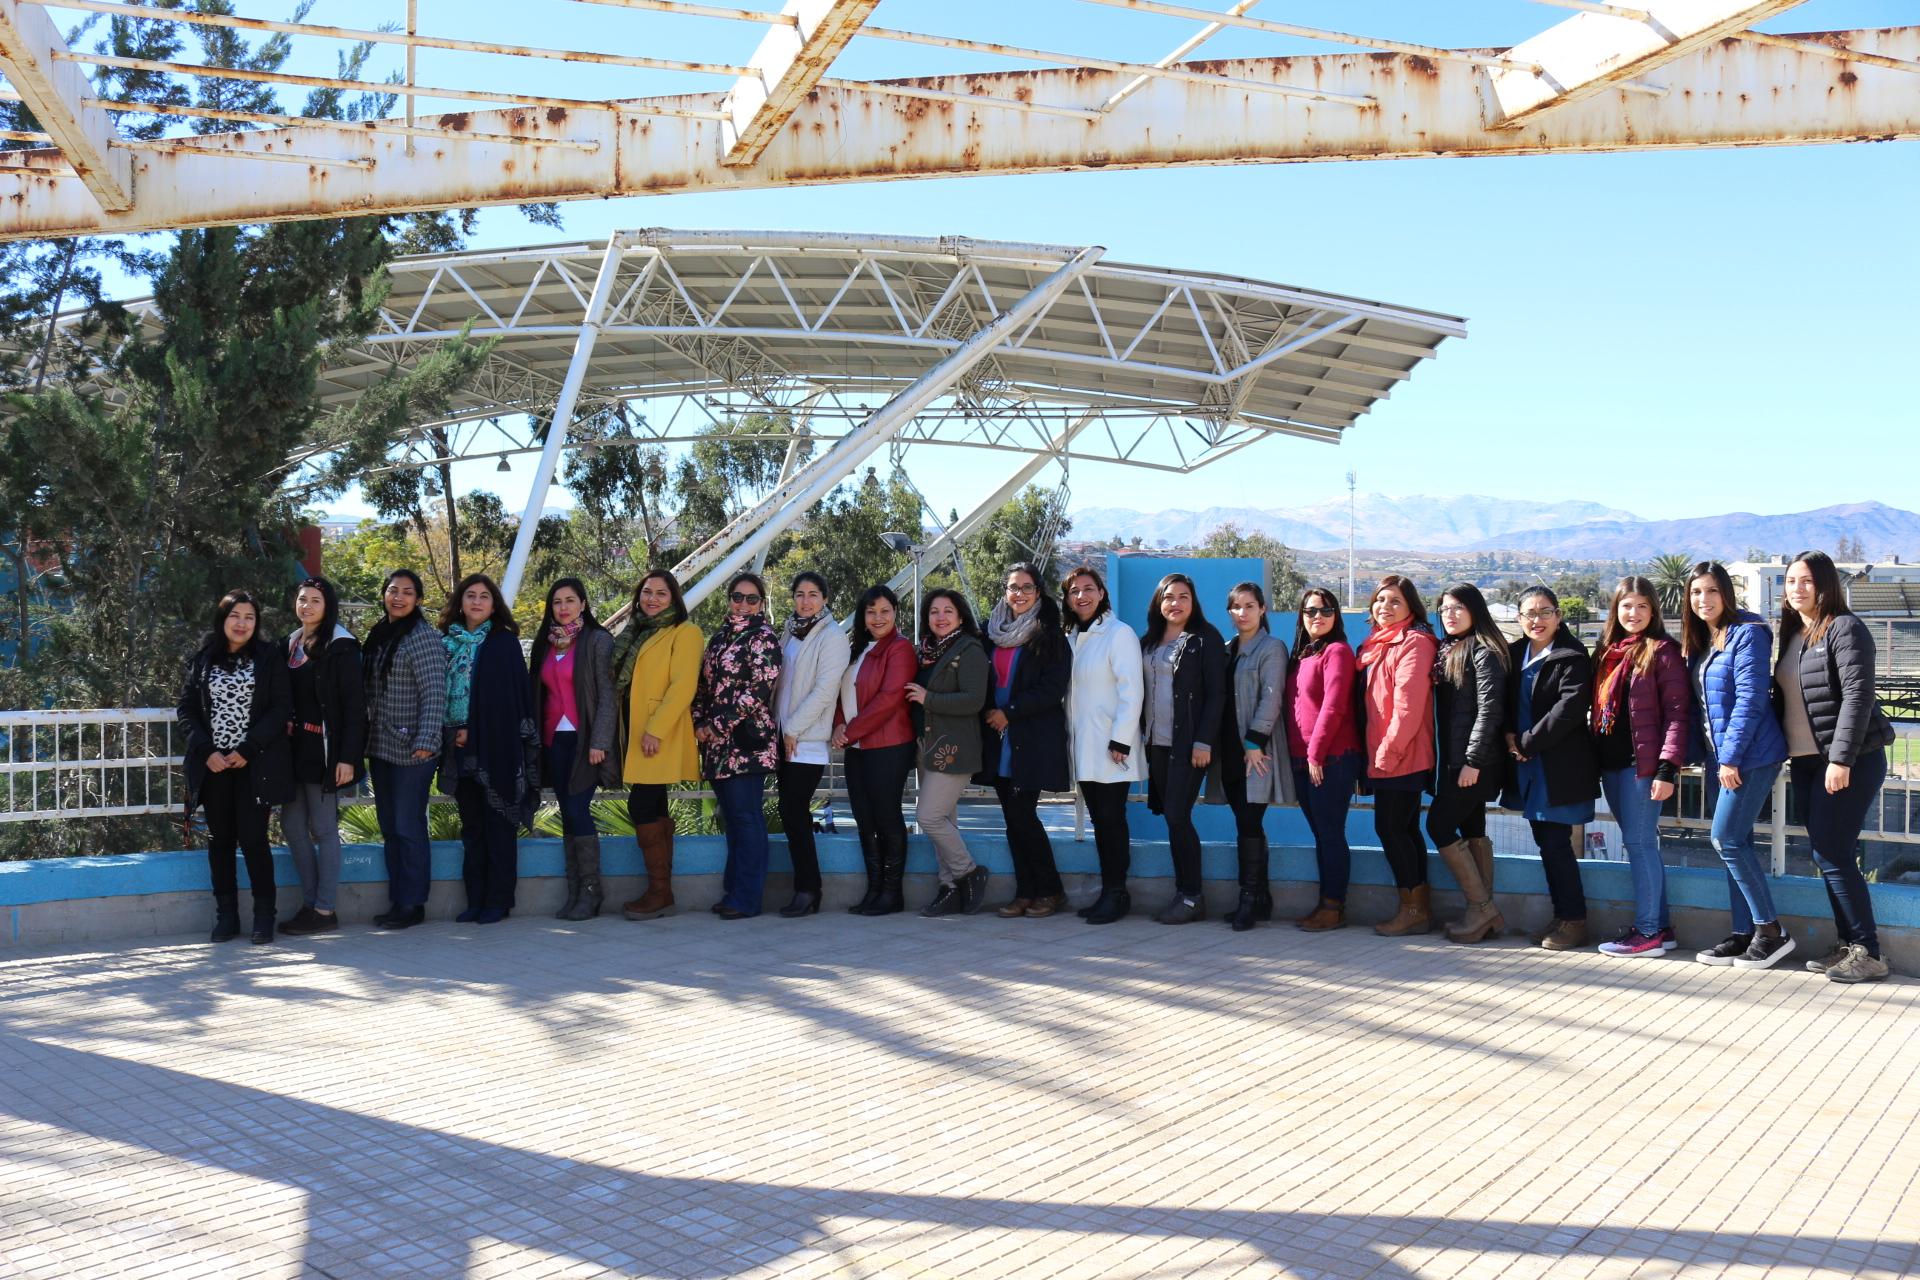 Grupo de coordinación Programa de Integración Escolar de Vallenar se reunieron por última vez